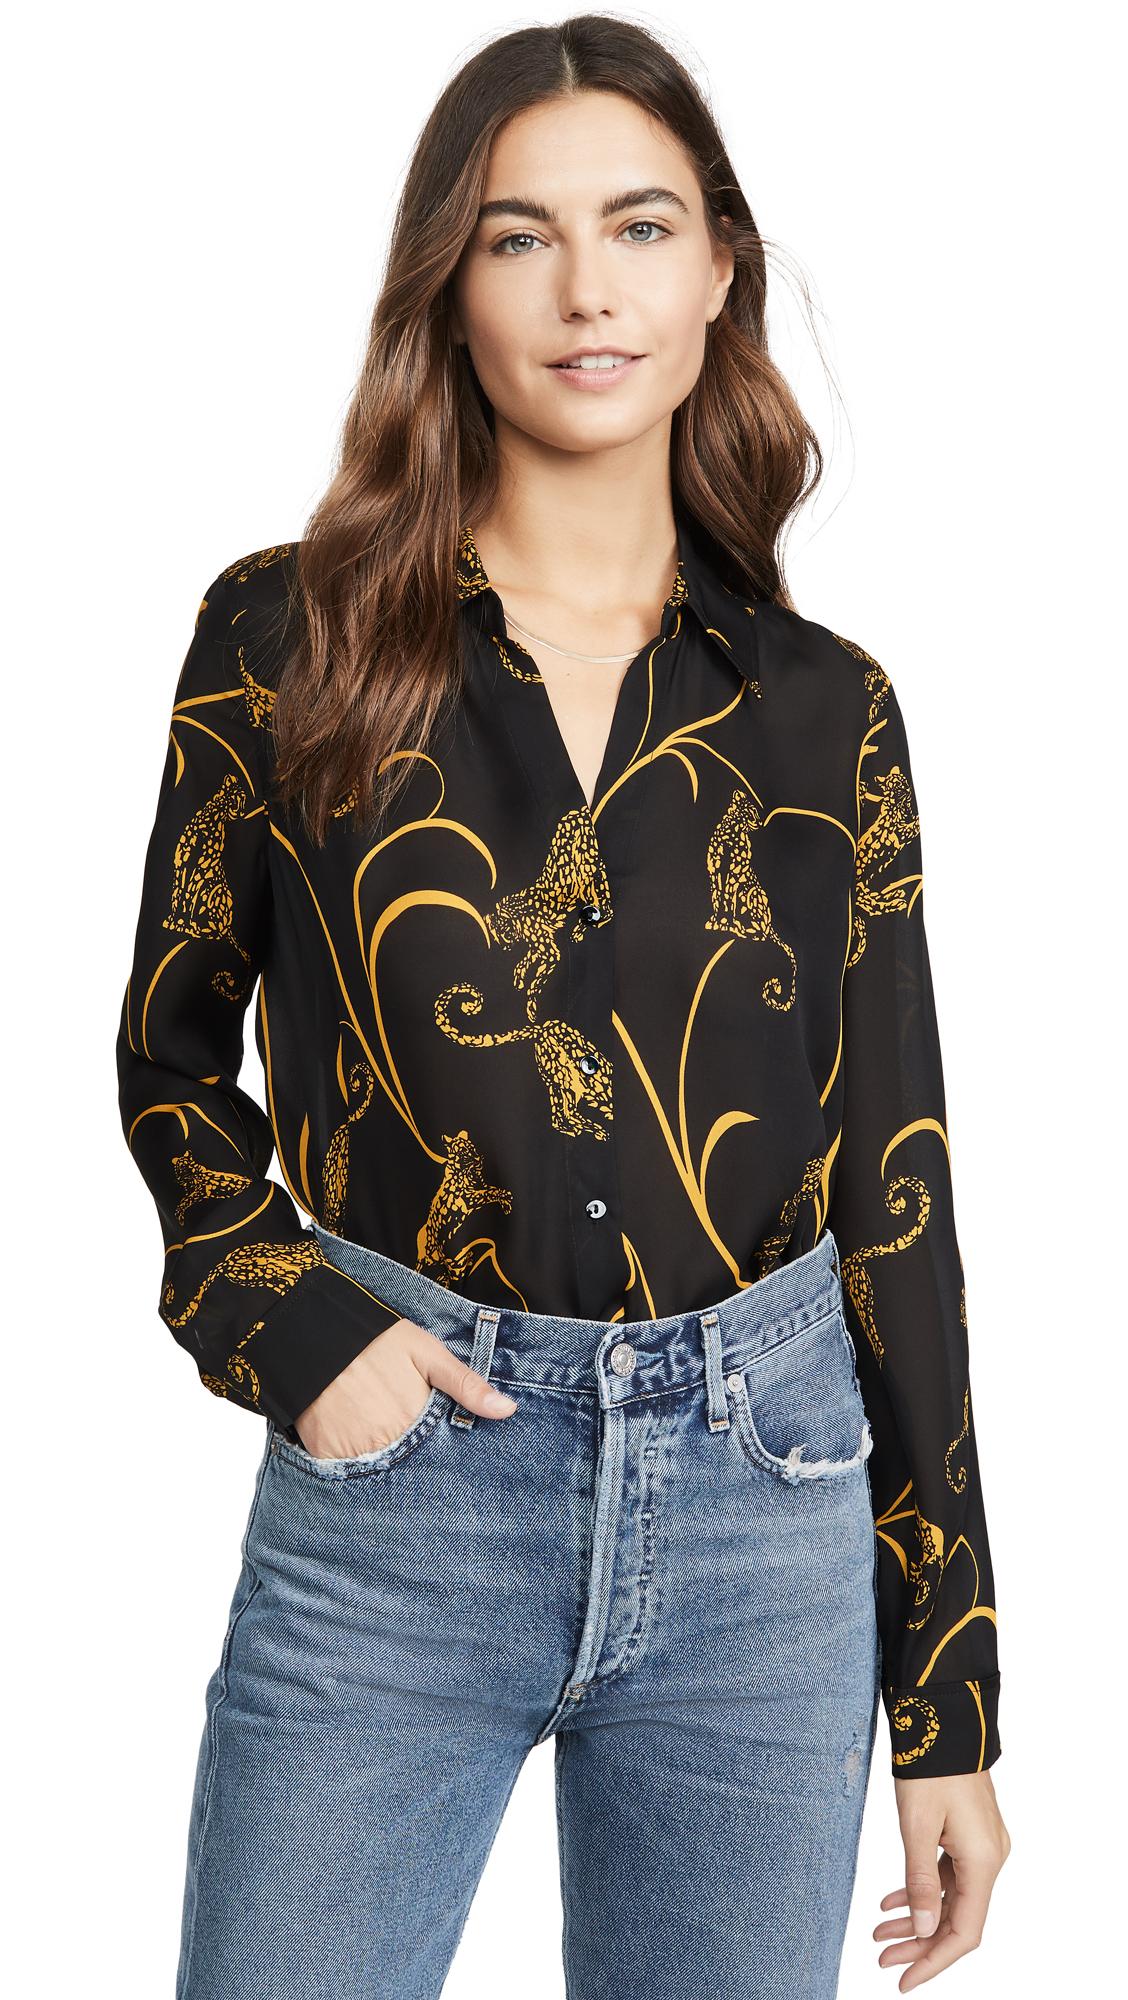 L'AGENCE Nina Long Sleeve Blouse - 30% Off Sale